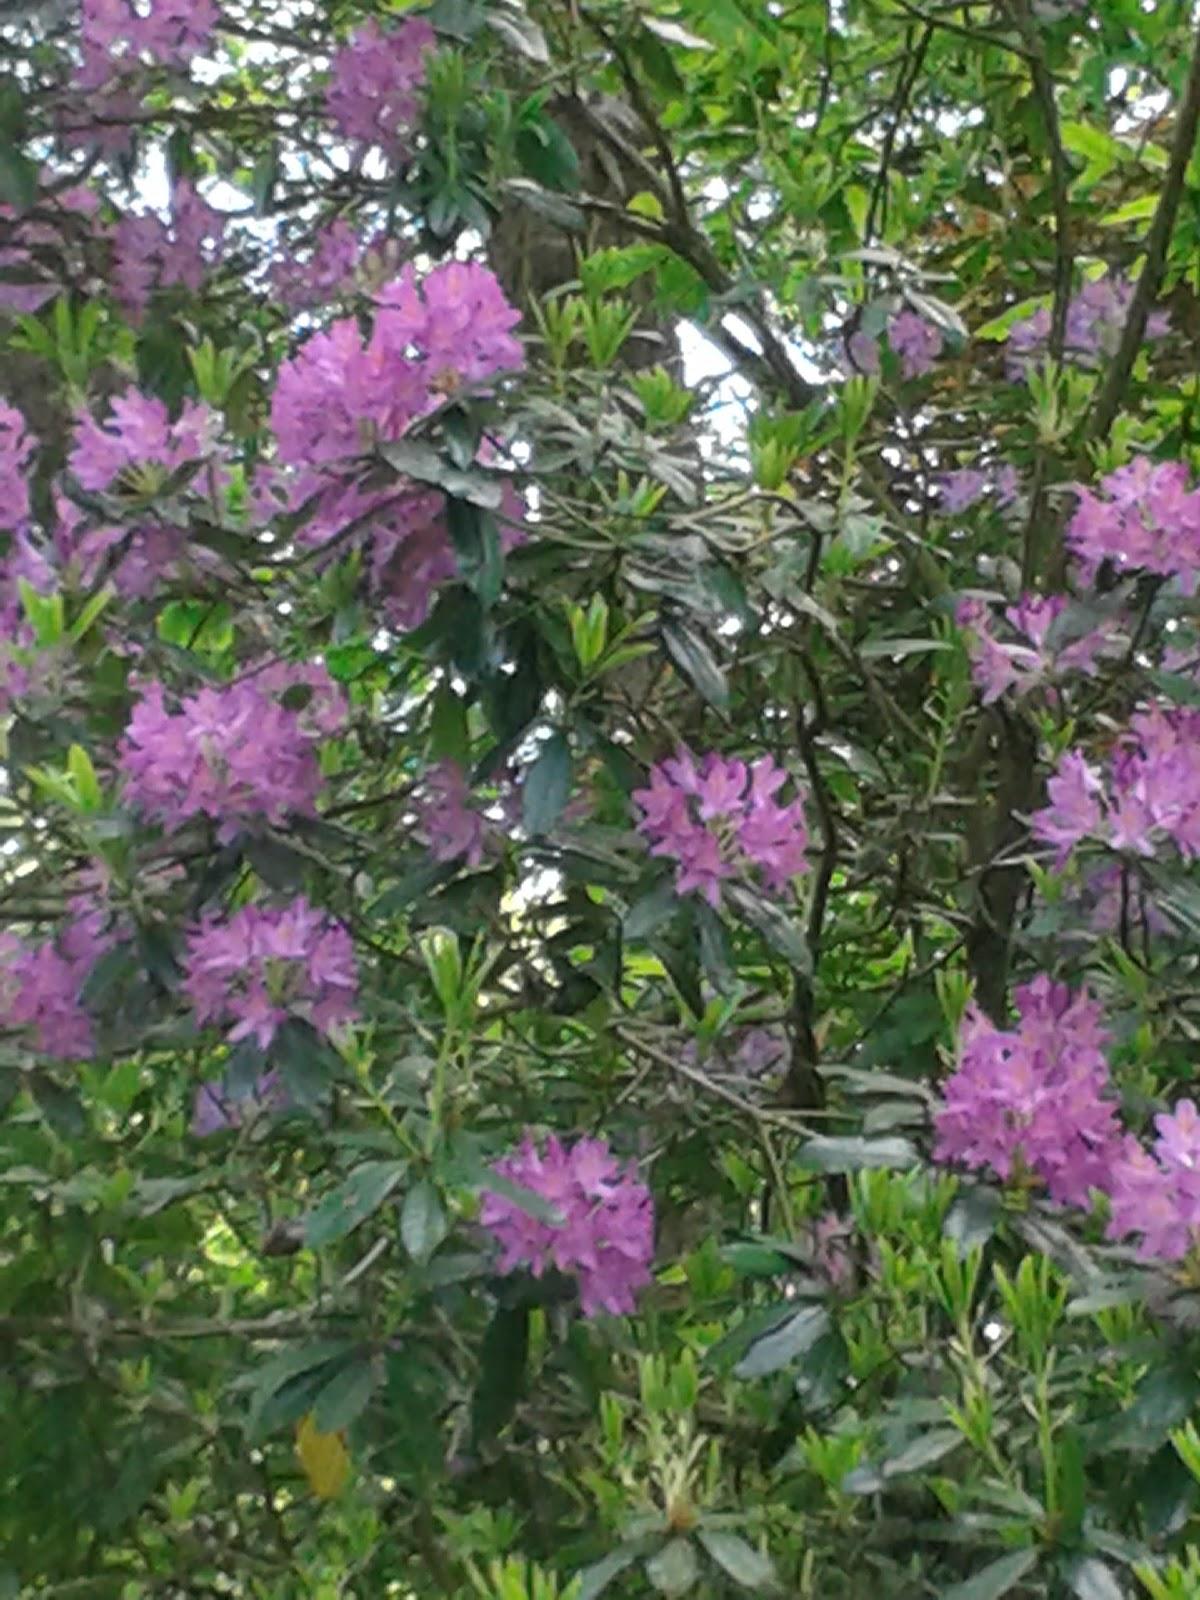 Flowers at National Trust Dyffryn Gardens - May 2015